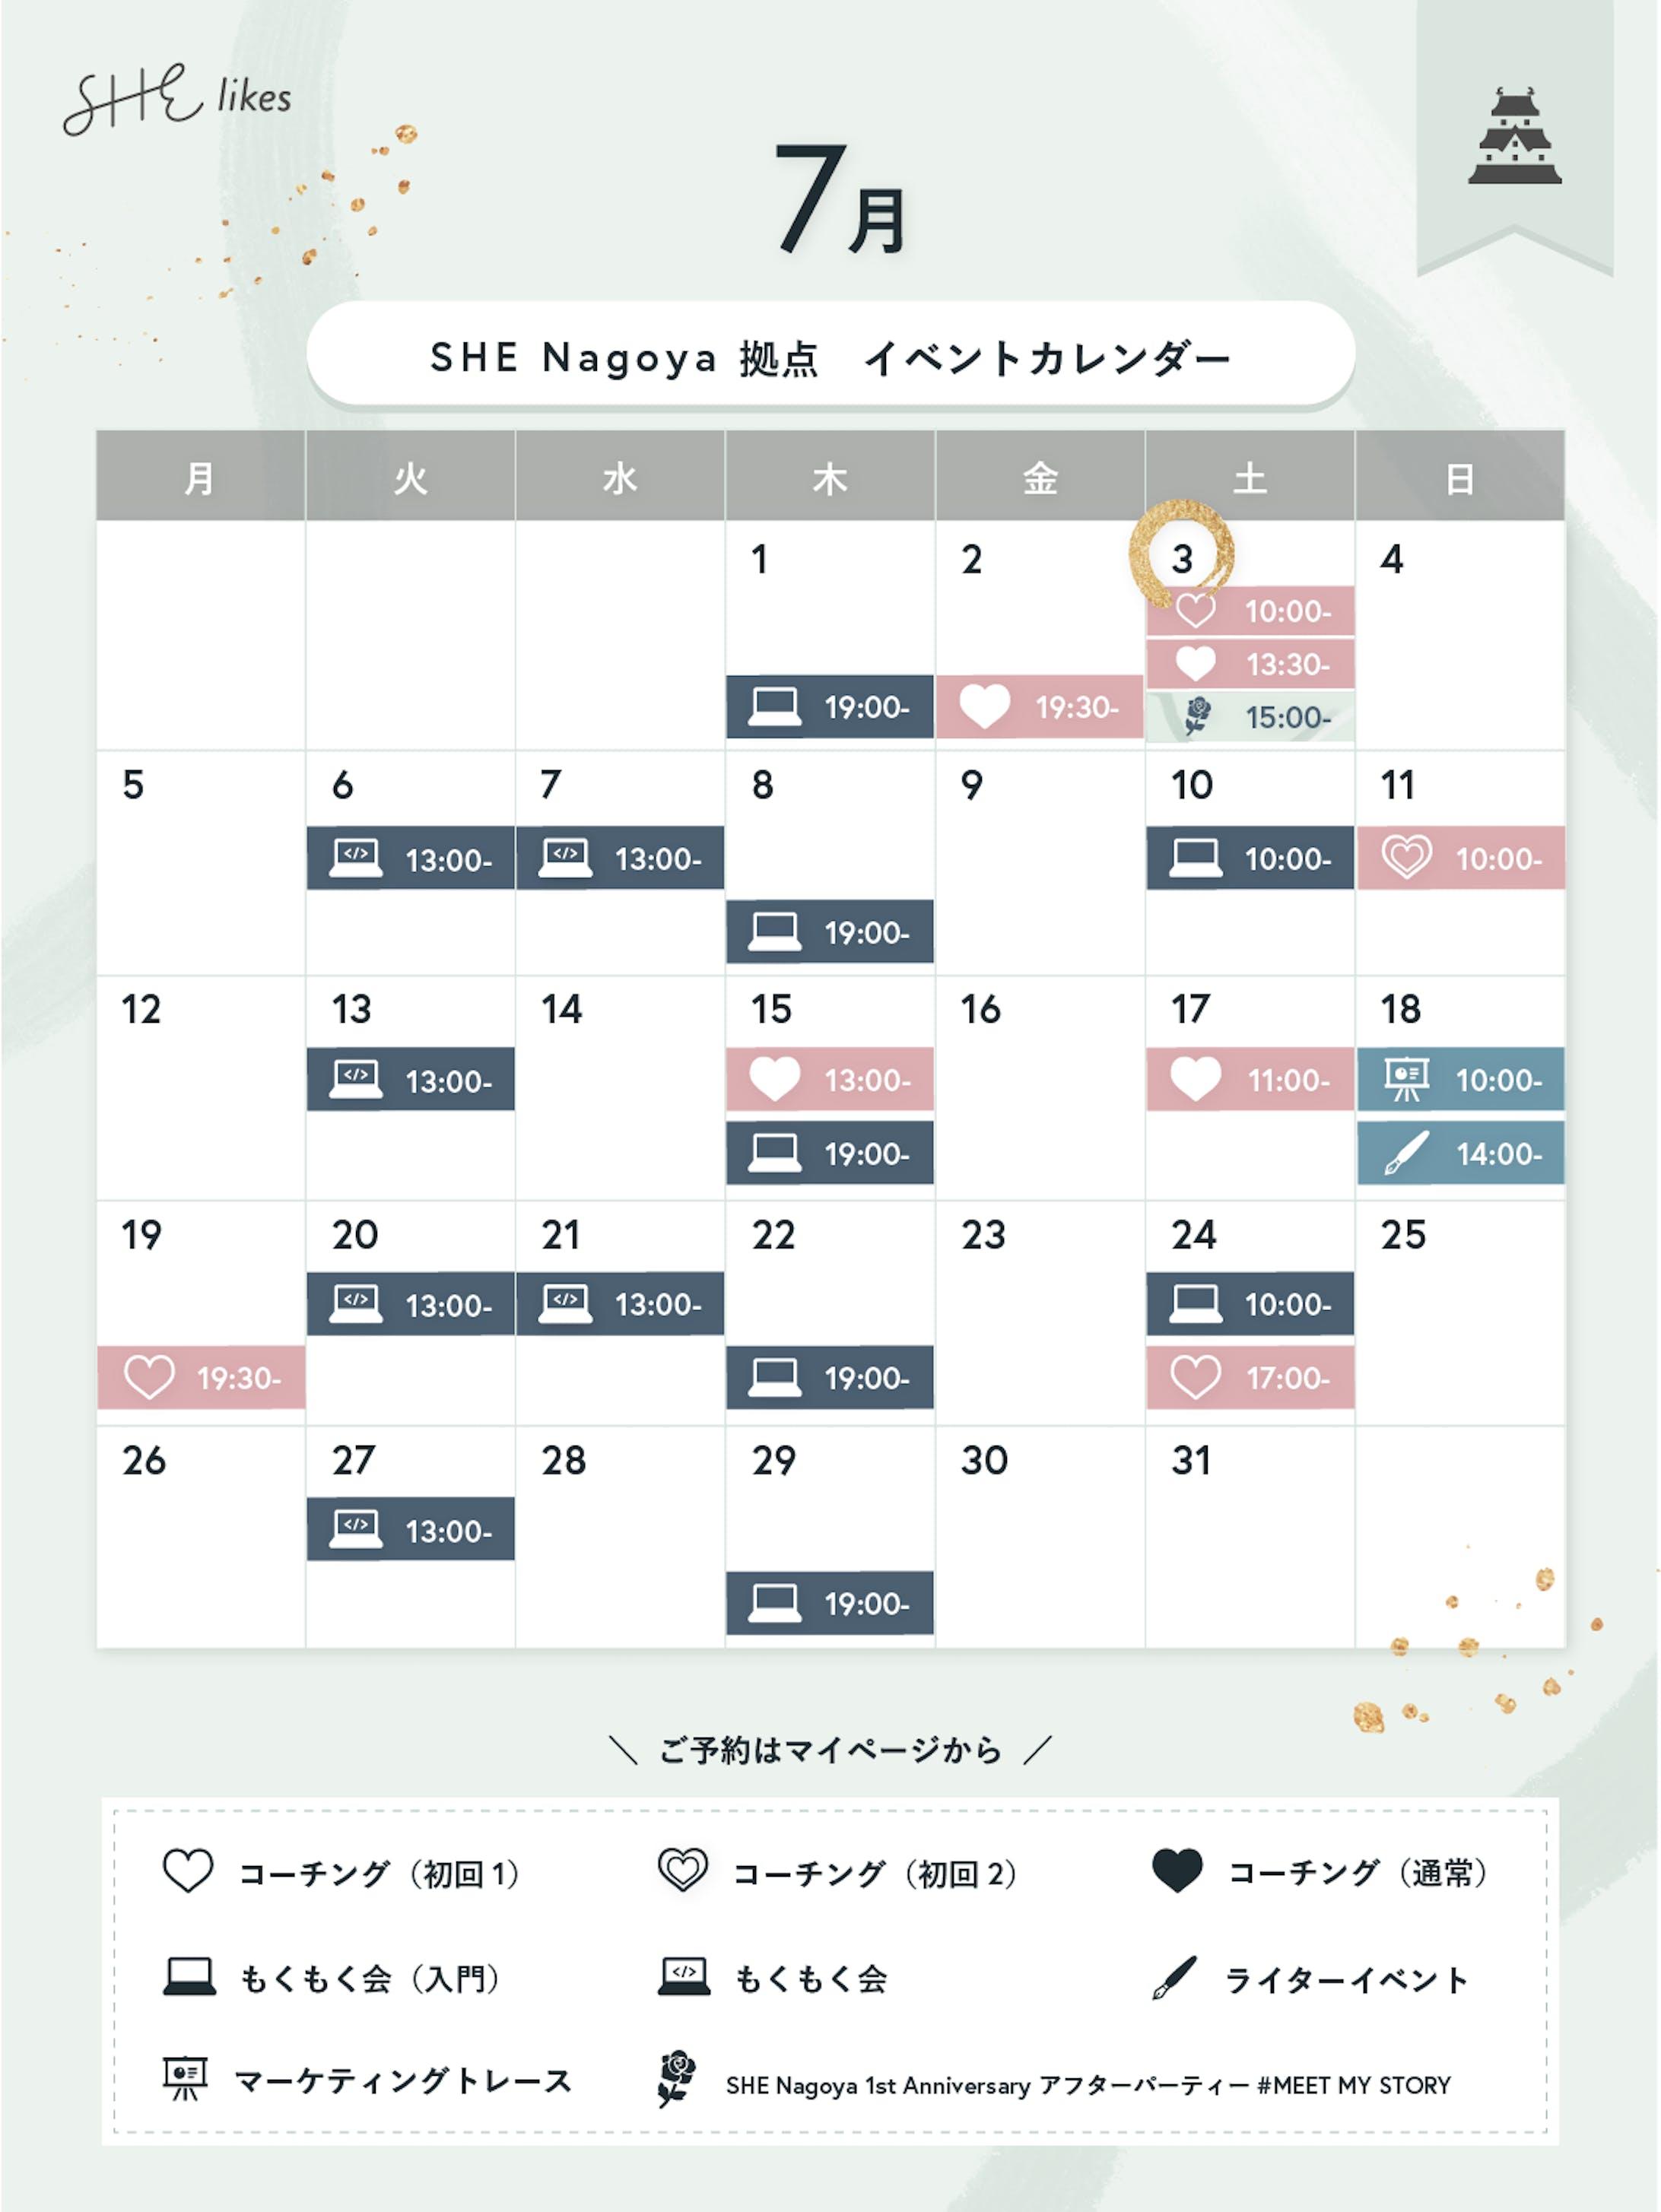 <SHE株式会社様> twitter用カレンダー-1